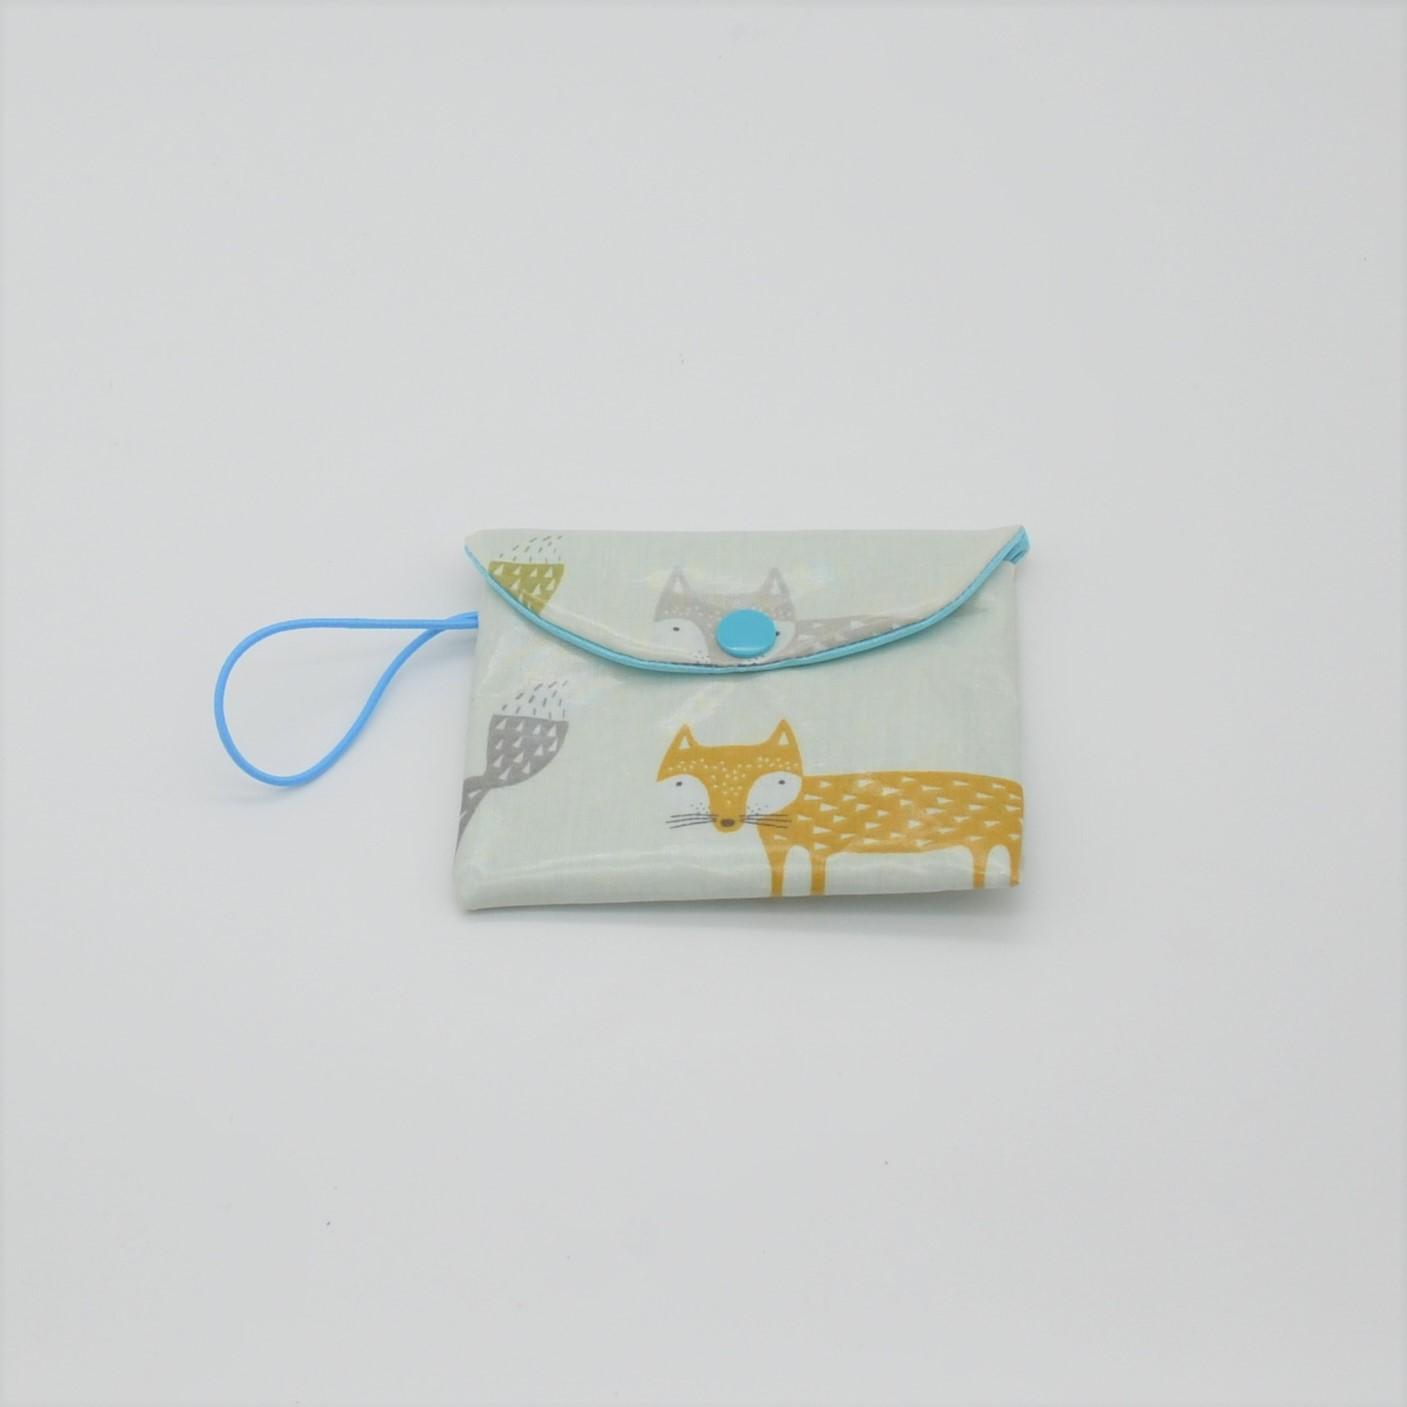 Etui imperméable savon motif renards--9995537141740